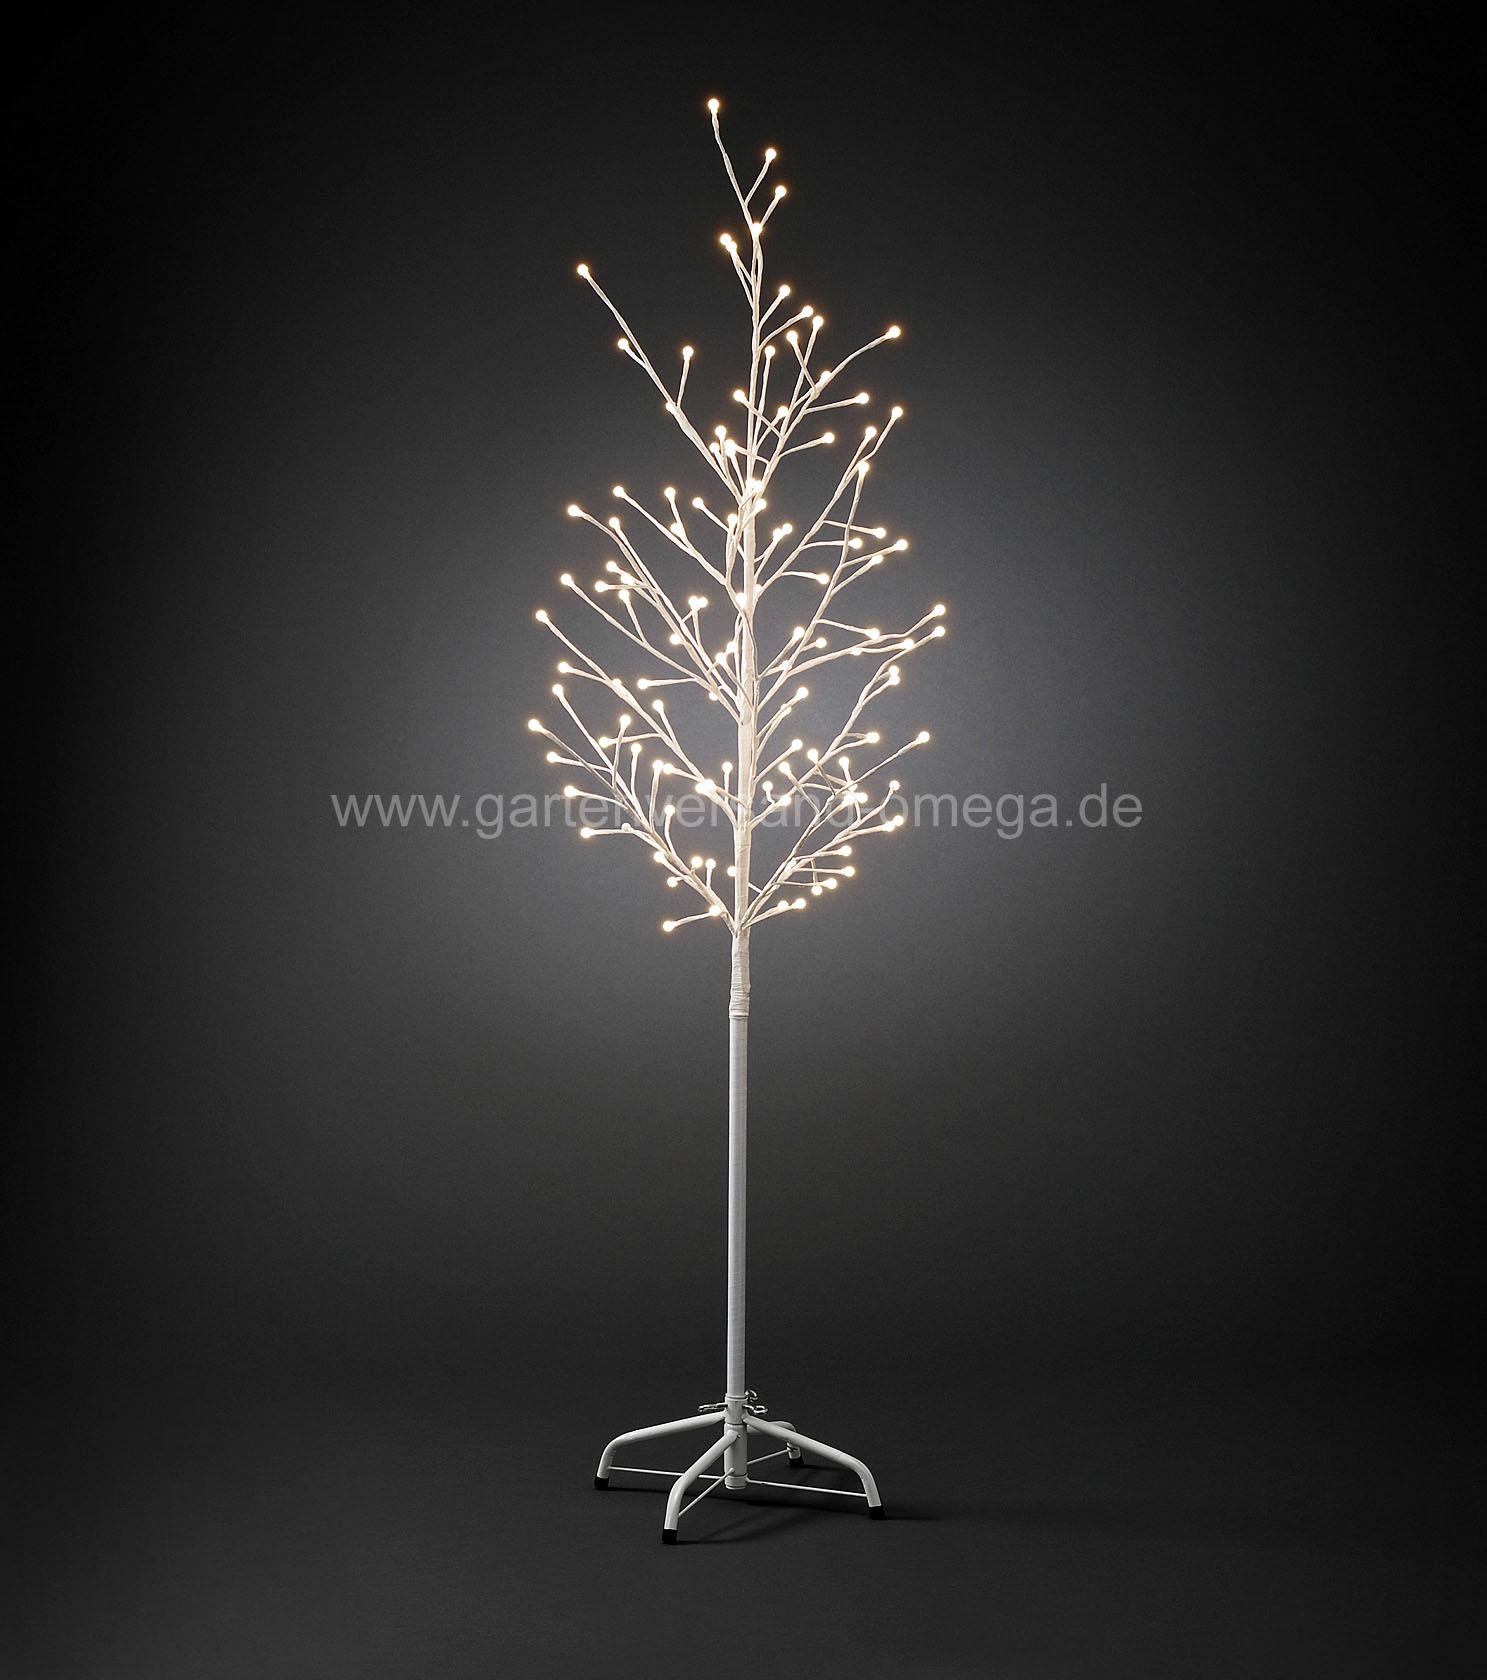 Led lichterbaum wei gro gro e weihnachtsbeleuchtung led baum led lichterzweige - Fensterbeleuchtung innen ...